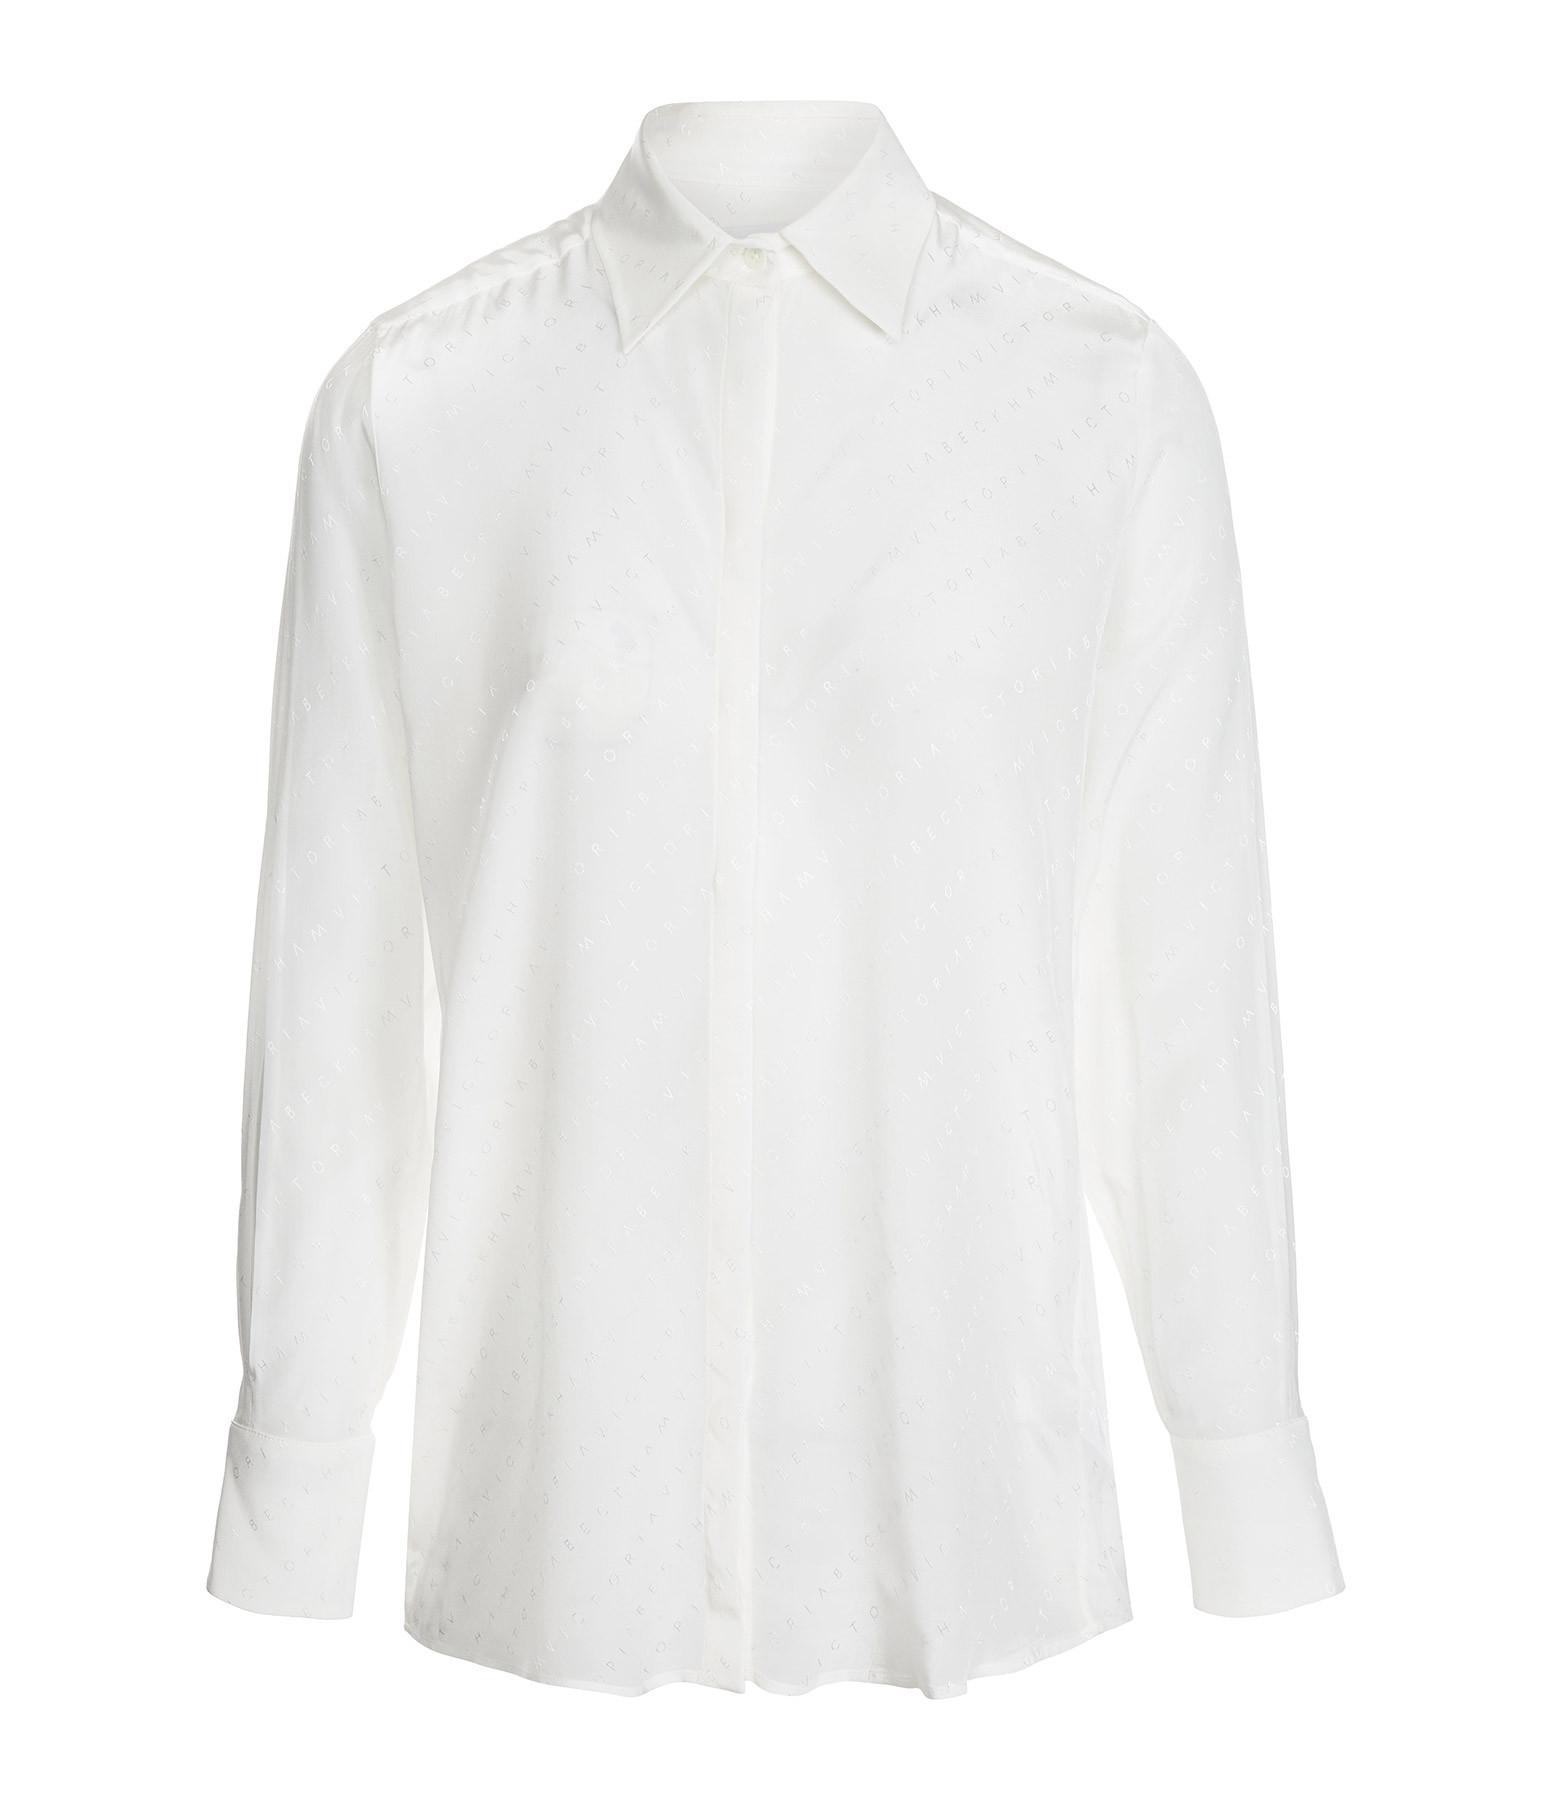 VICTORIA VICTORIA BECKHAM - Chemise Manches Fendues Blanc